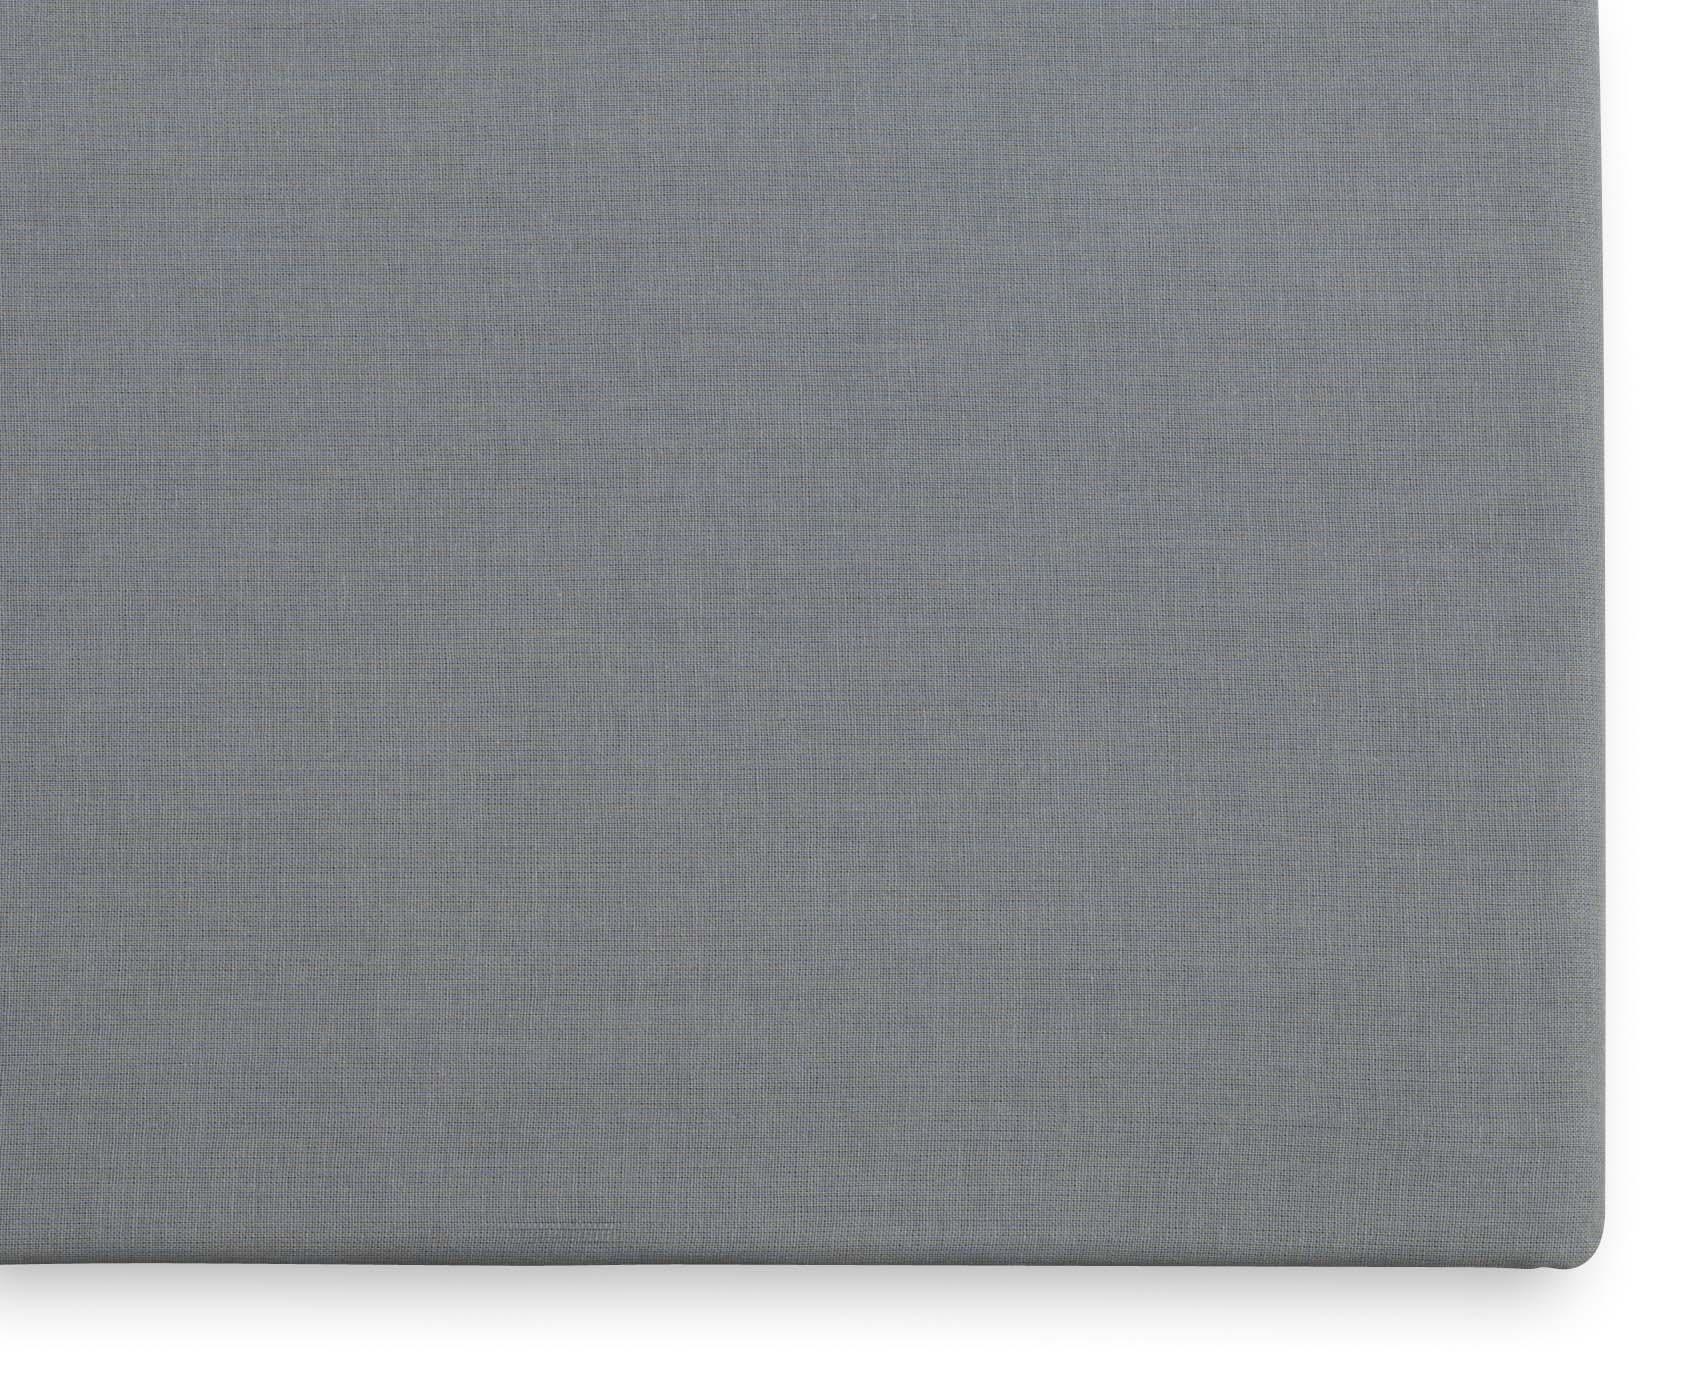 örngott-50x60cm